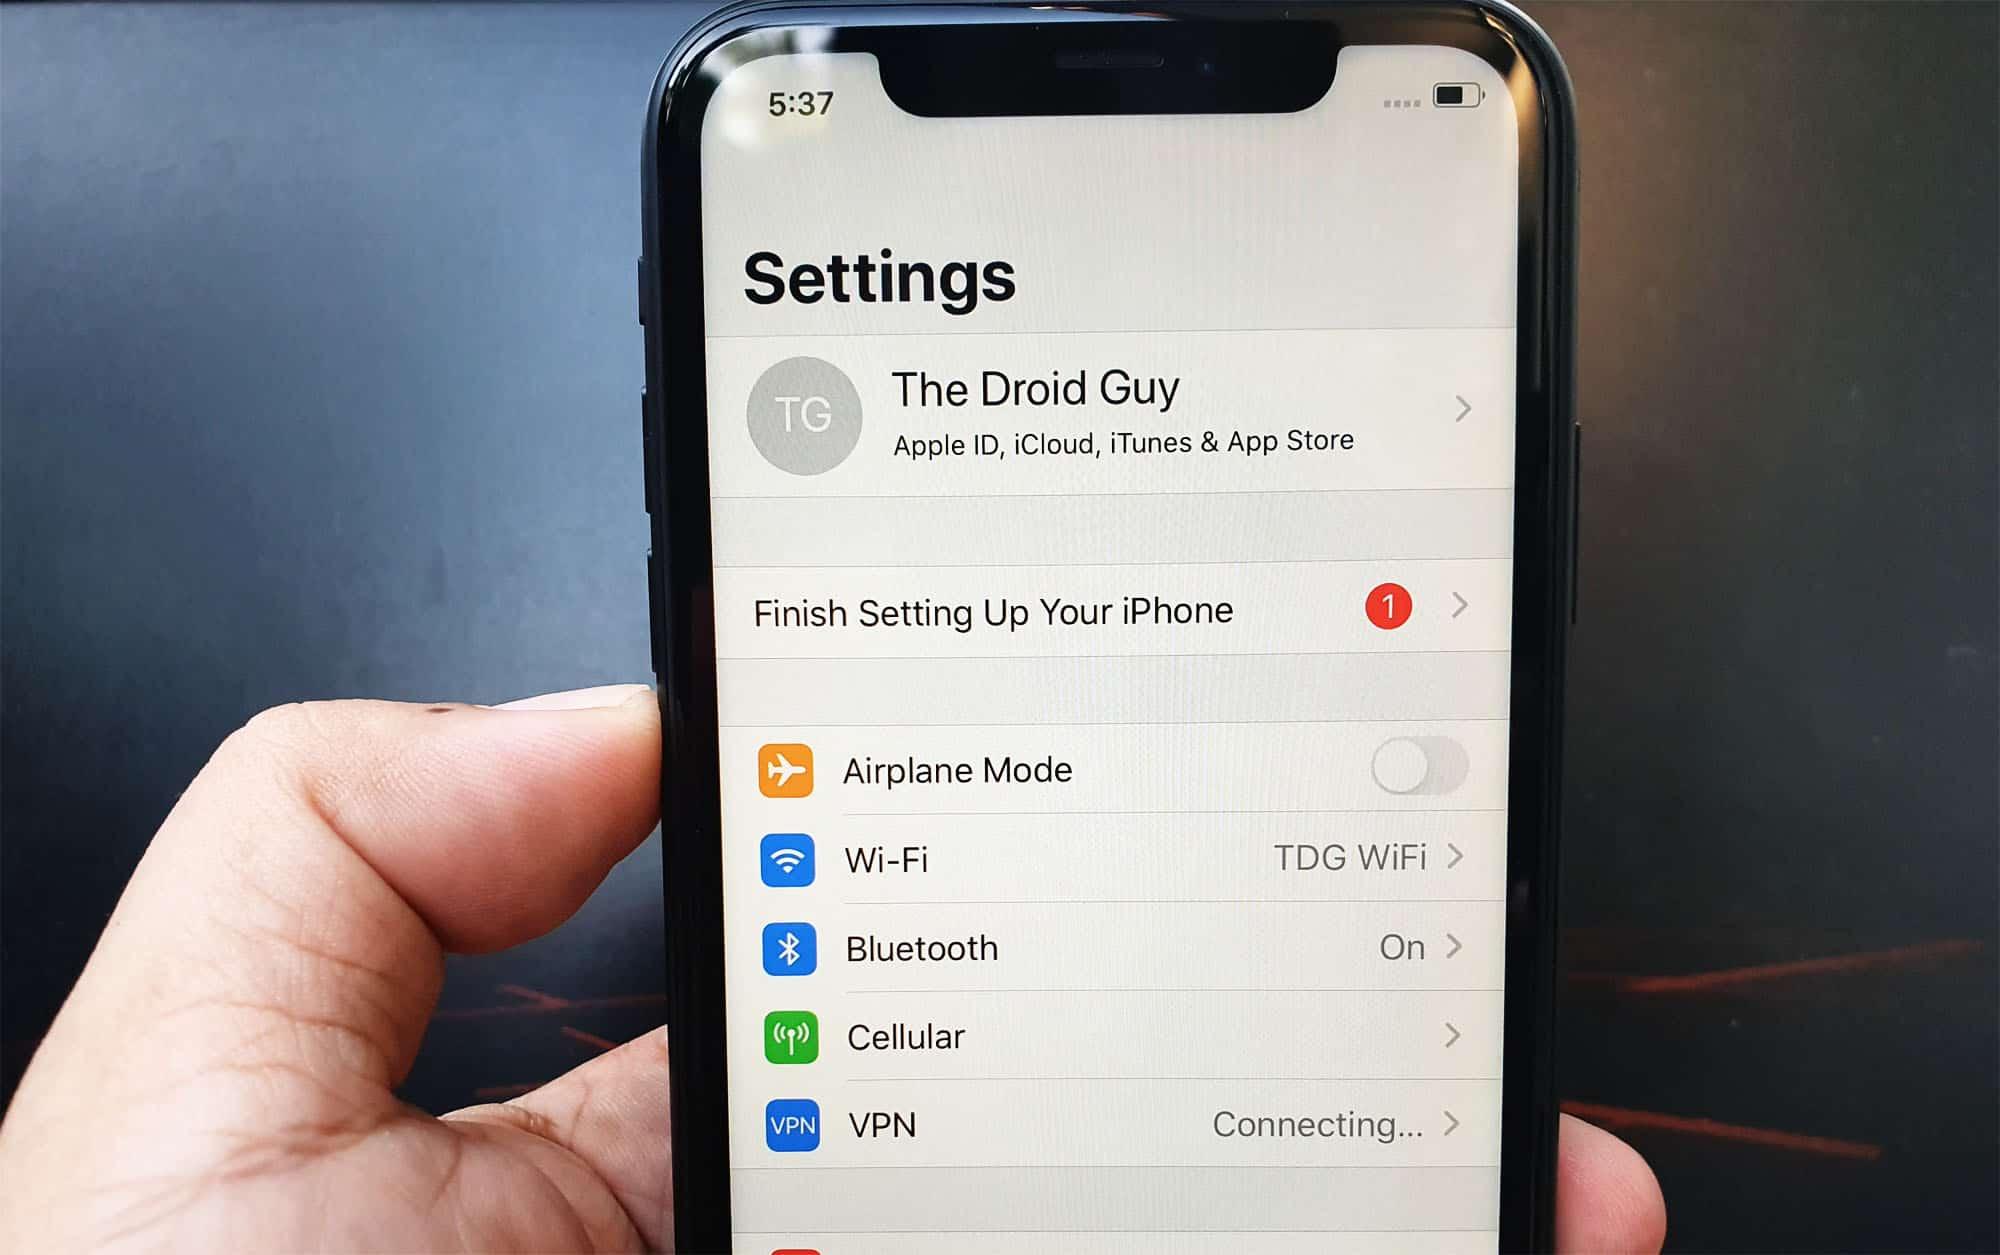 restart iphone x, won't reboot, not responding